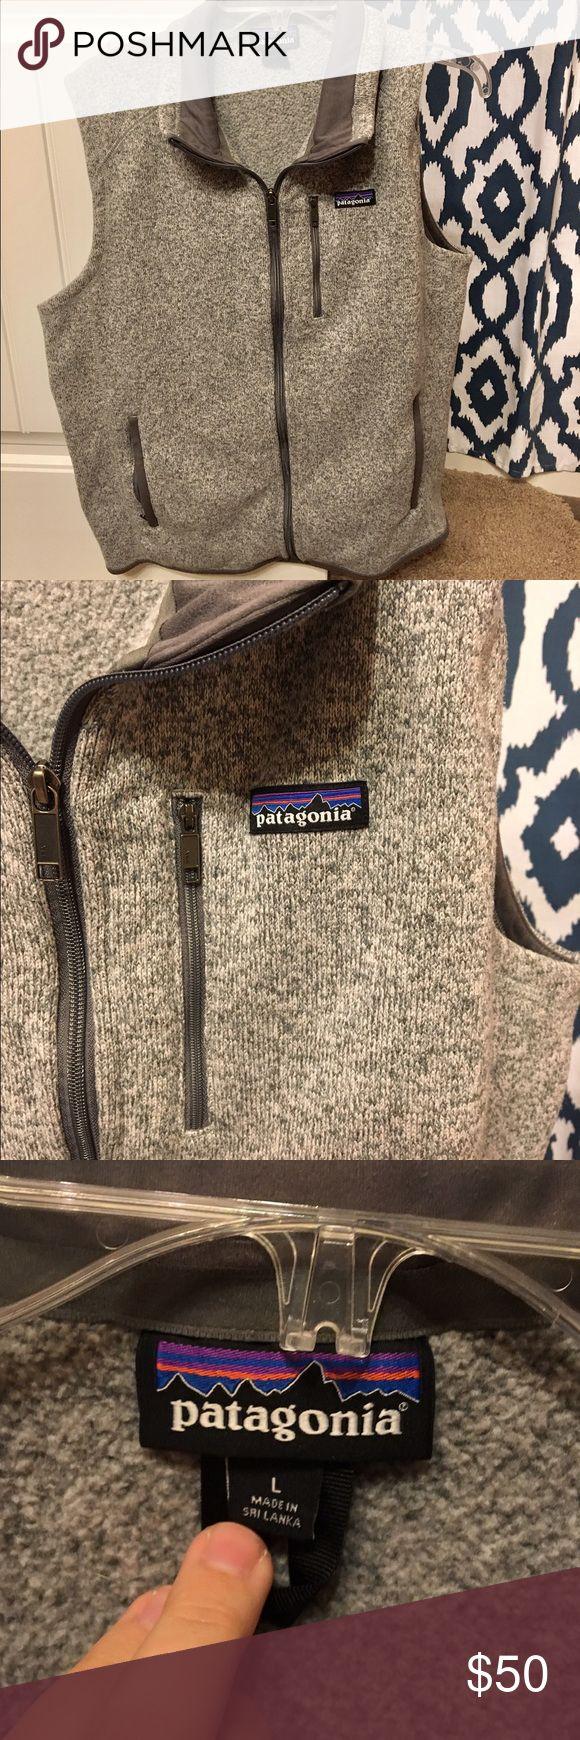 Patagonia better sweater vest Men's large. Better sweater Patagonia vest. Great shape. Patagonia Jackets & Coats Vests